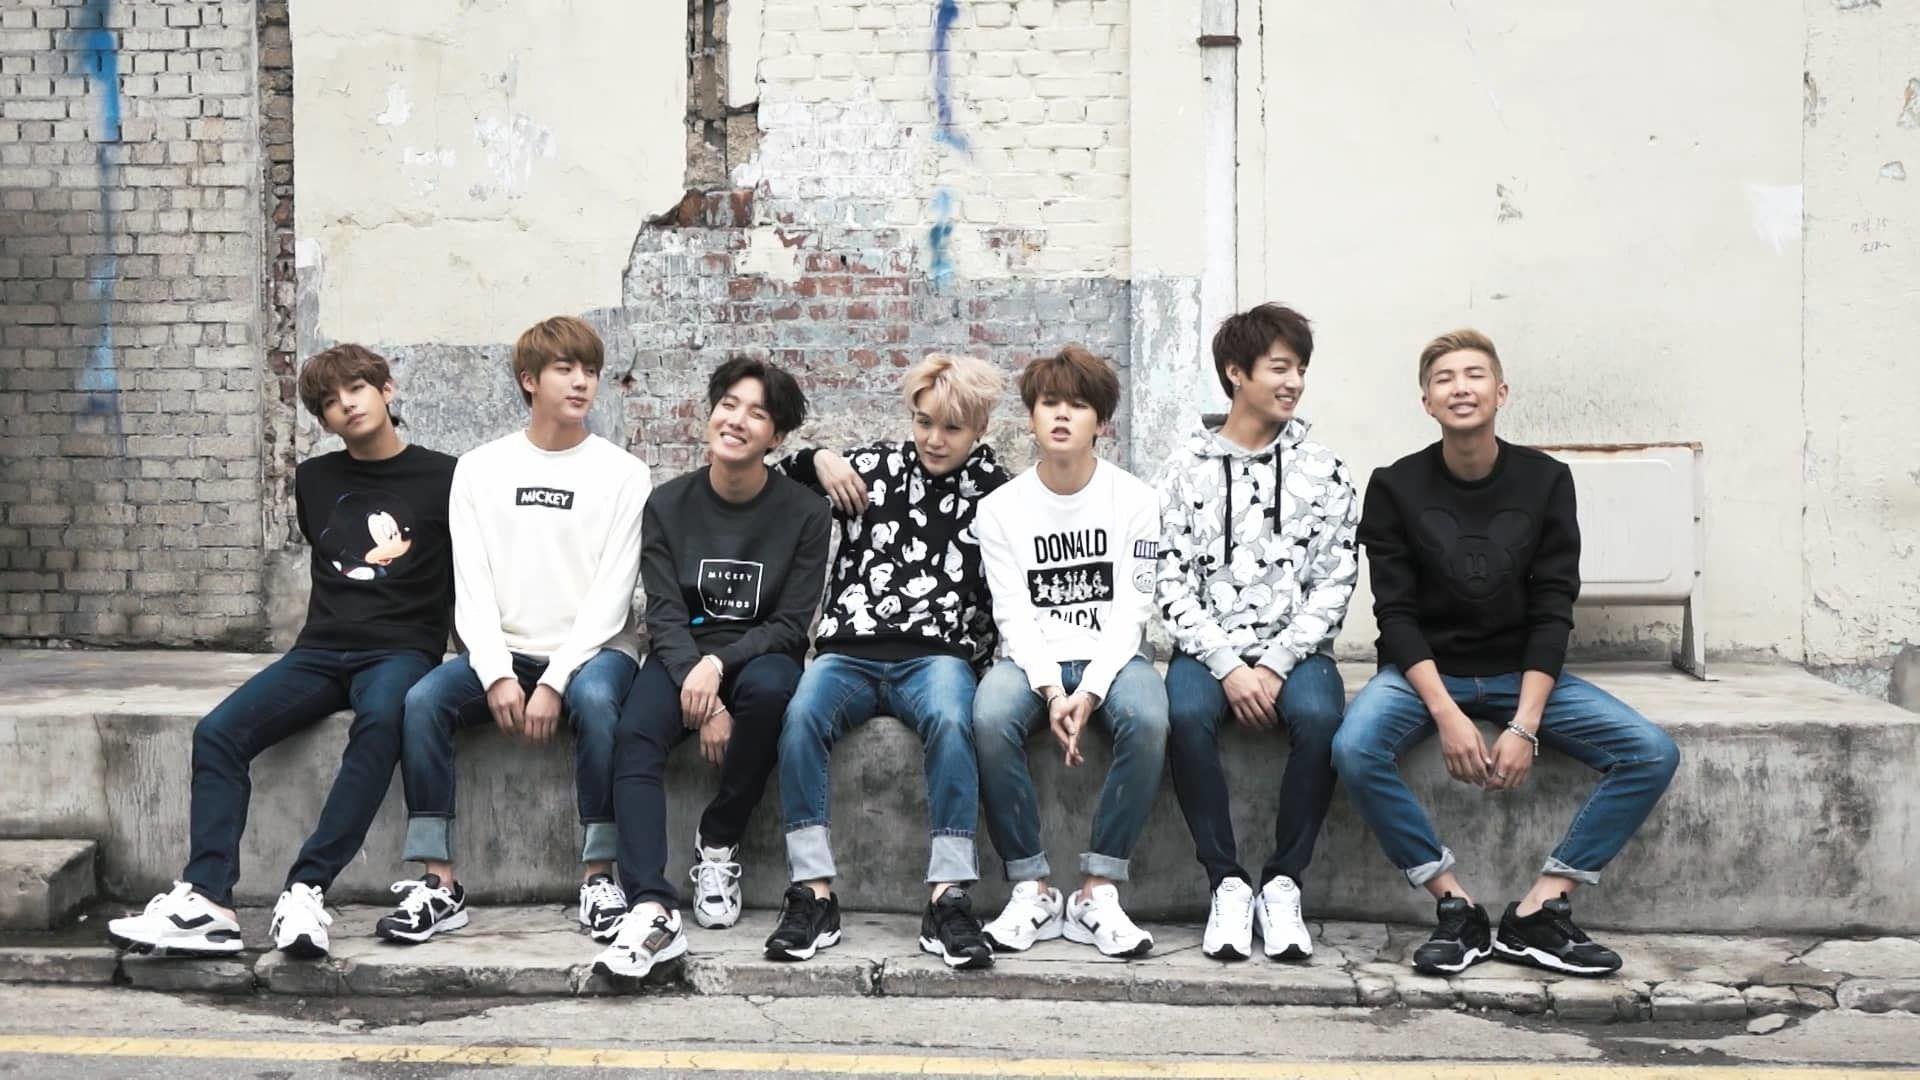 BTS 2018 Wallpapers - Wallpaper Cave